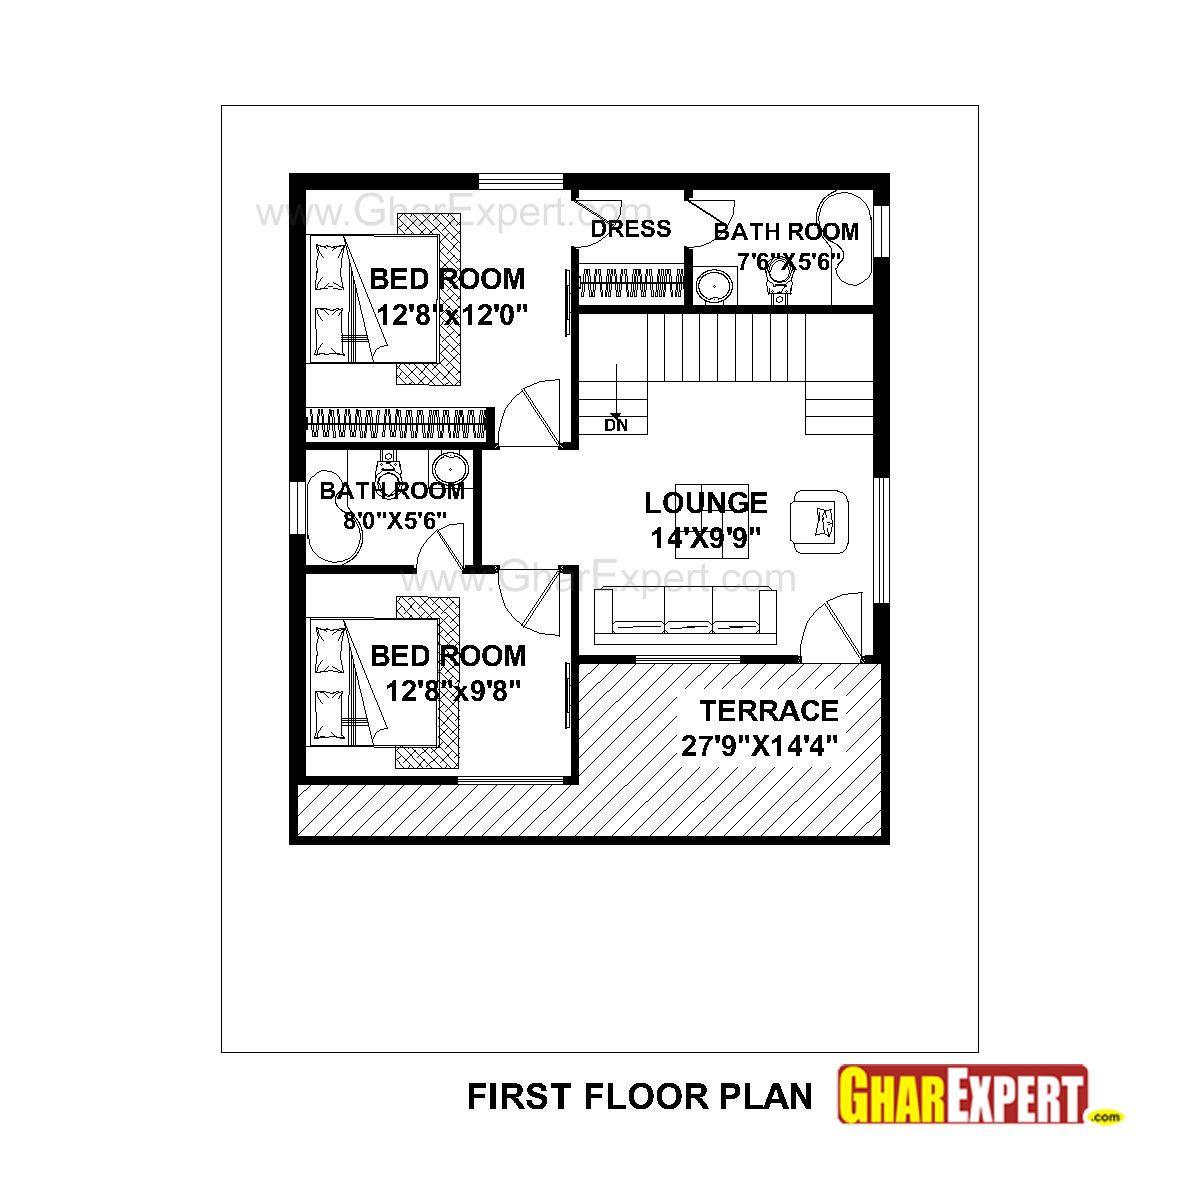 Vastu House Plan West Facting 150 Sq Yards Contact For Vastu Plans 919855783783 House Map Vastu House Indian House Plans